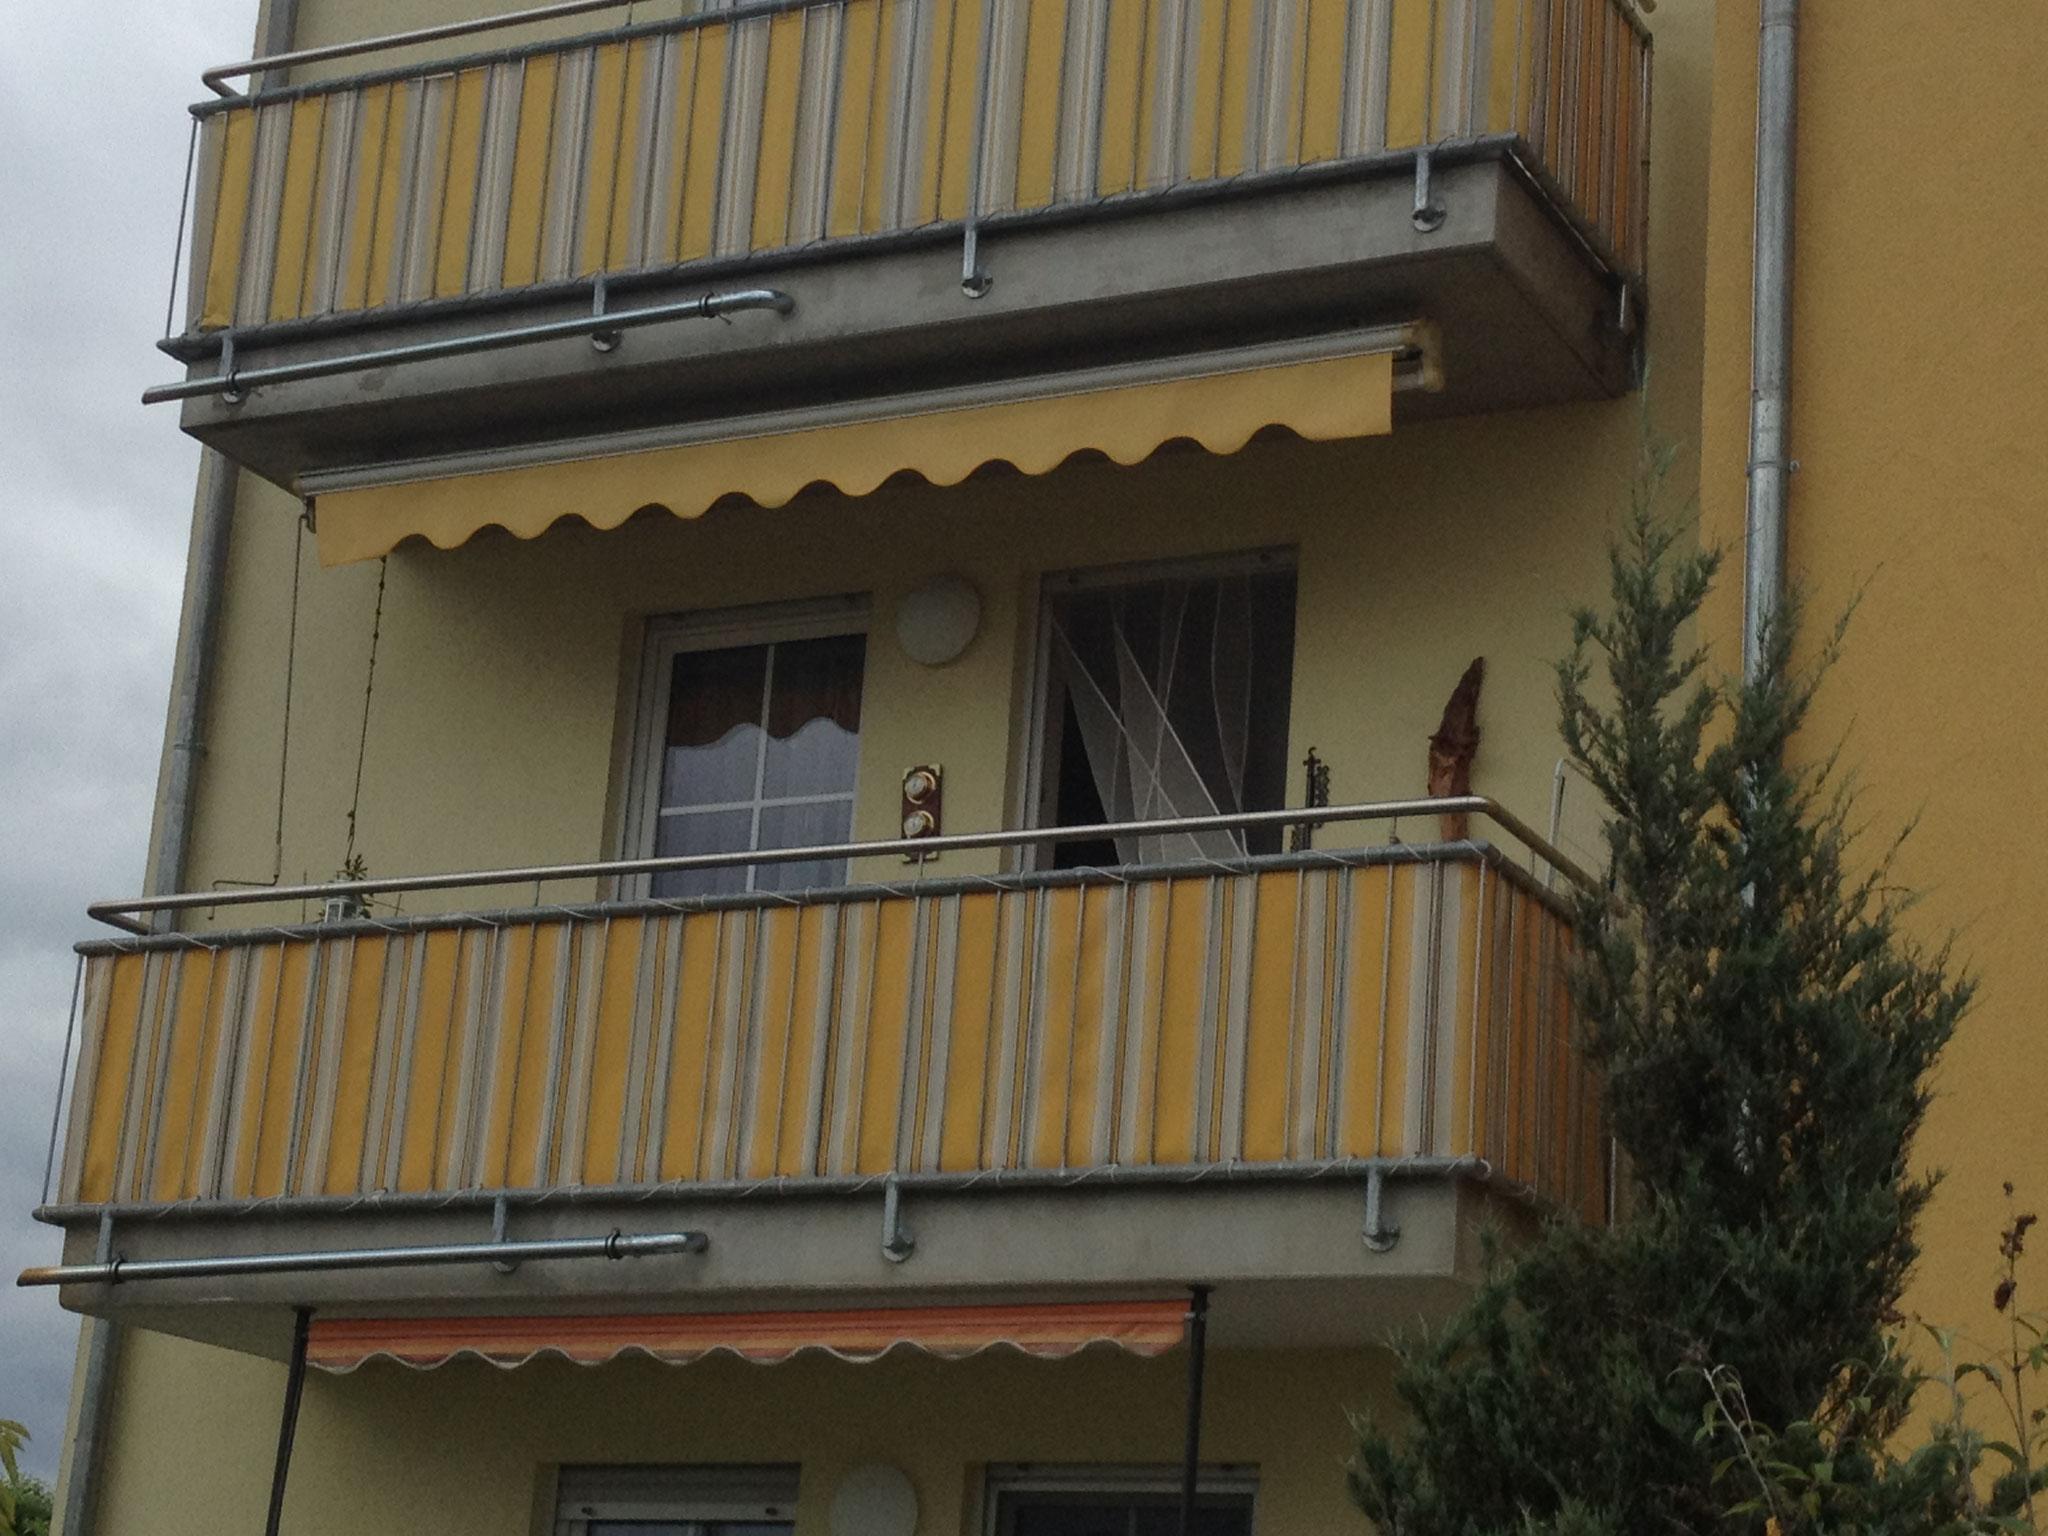 Markise Deluxe Plus und Balkonumrandung